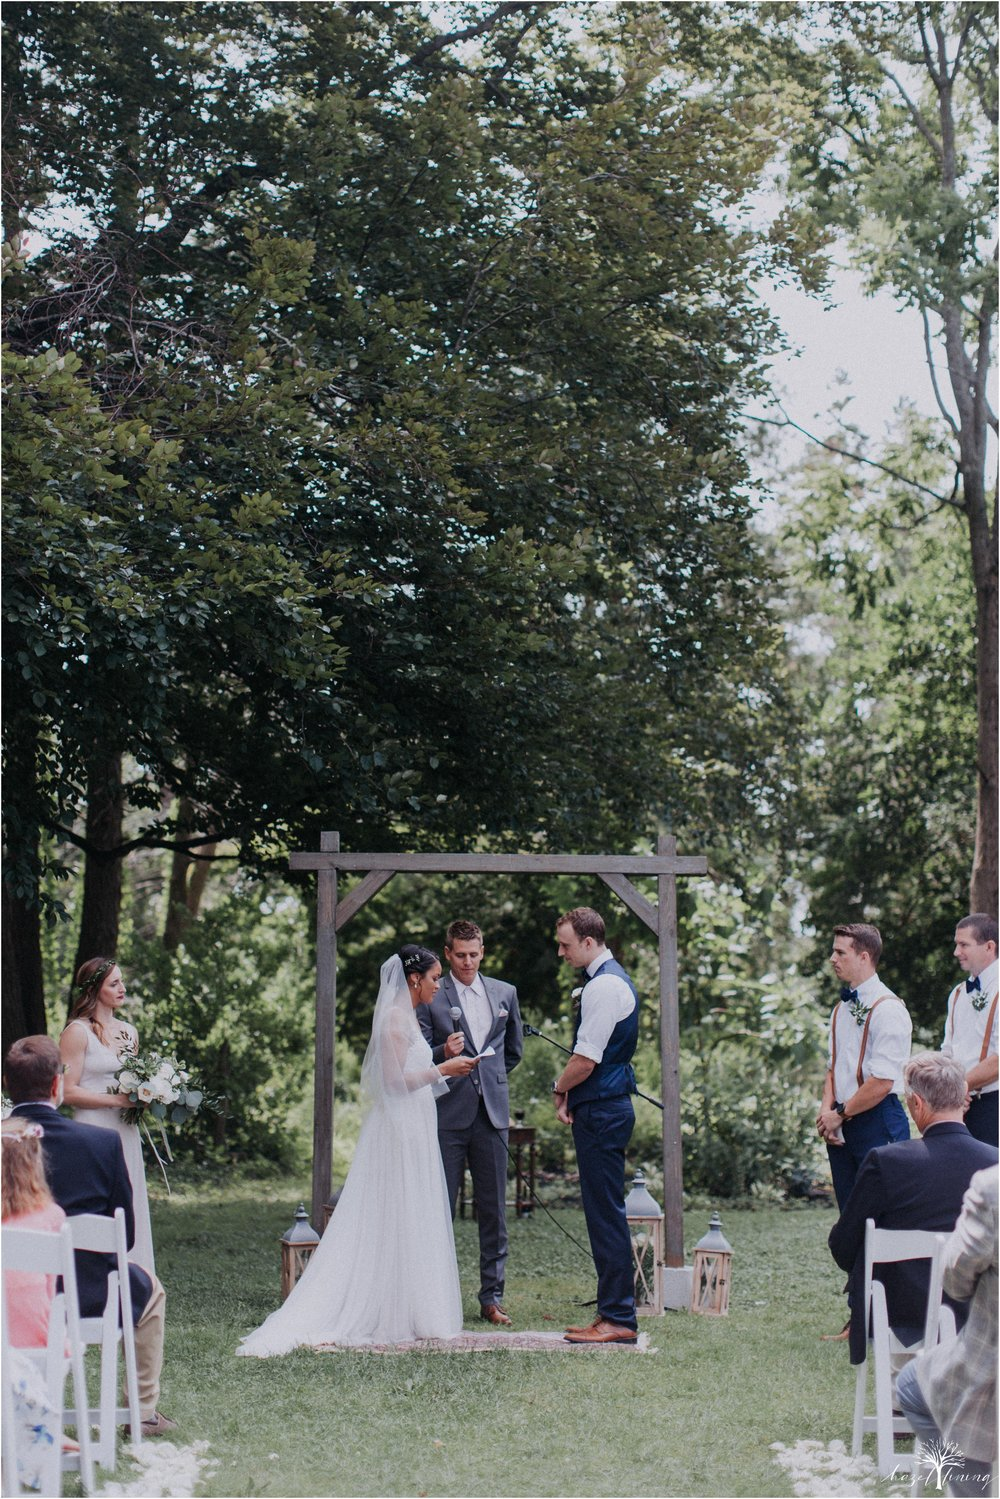 mariah-kreyling-samuel-sherratt-sherrattwiththeworld-peirce-farm-at-witch-hill-boston-massachusetts-wedding-photography-hazel-lining-travel-wedding-elopement-photography_0085.jpg